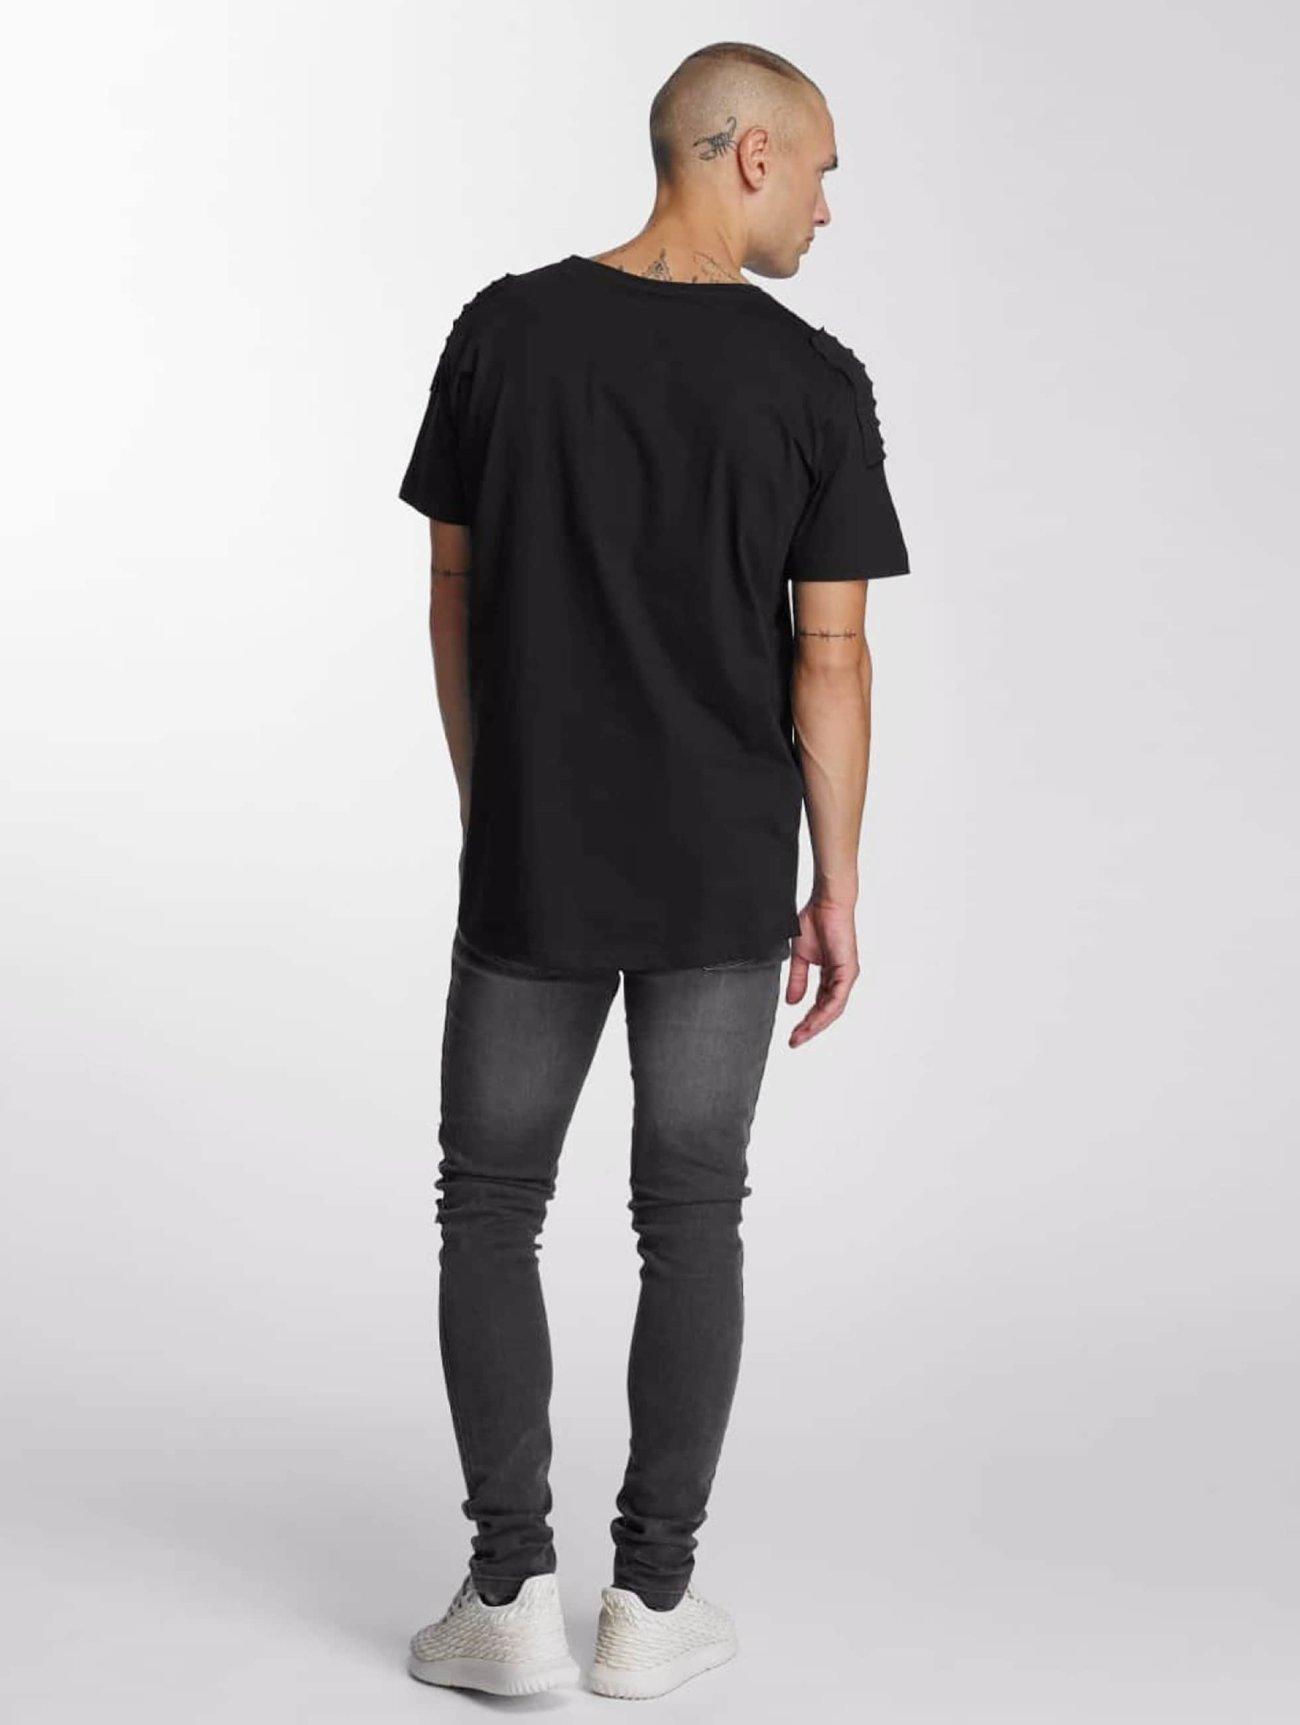 Bangastic Överdel / T-shirt Chennai i svart 355433 Män Överdelar